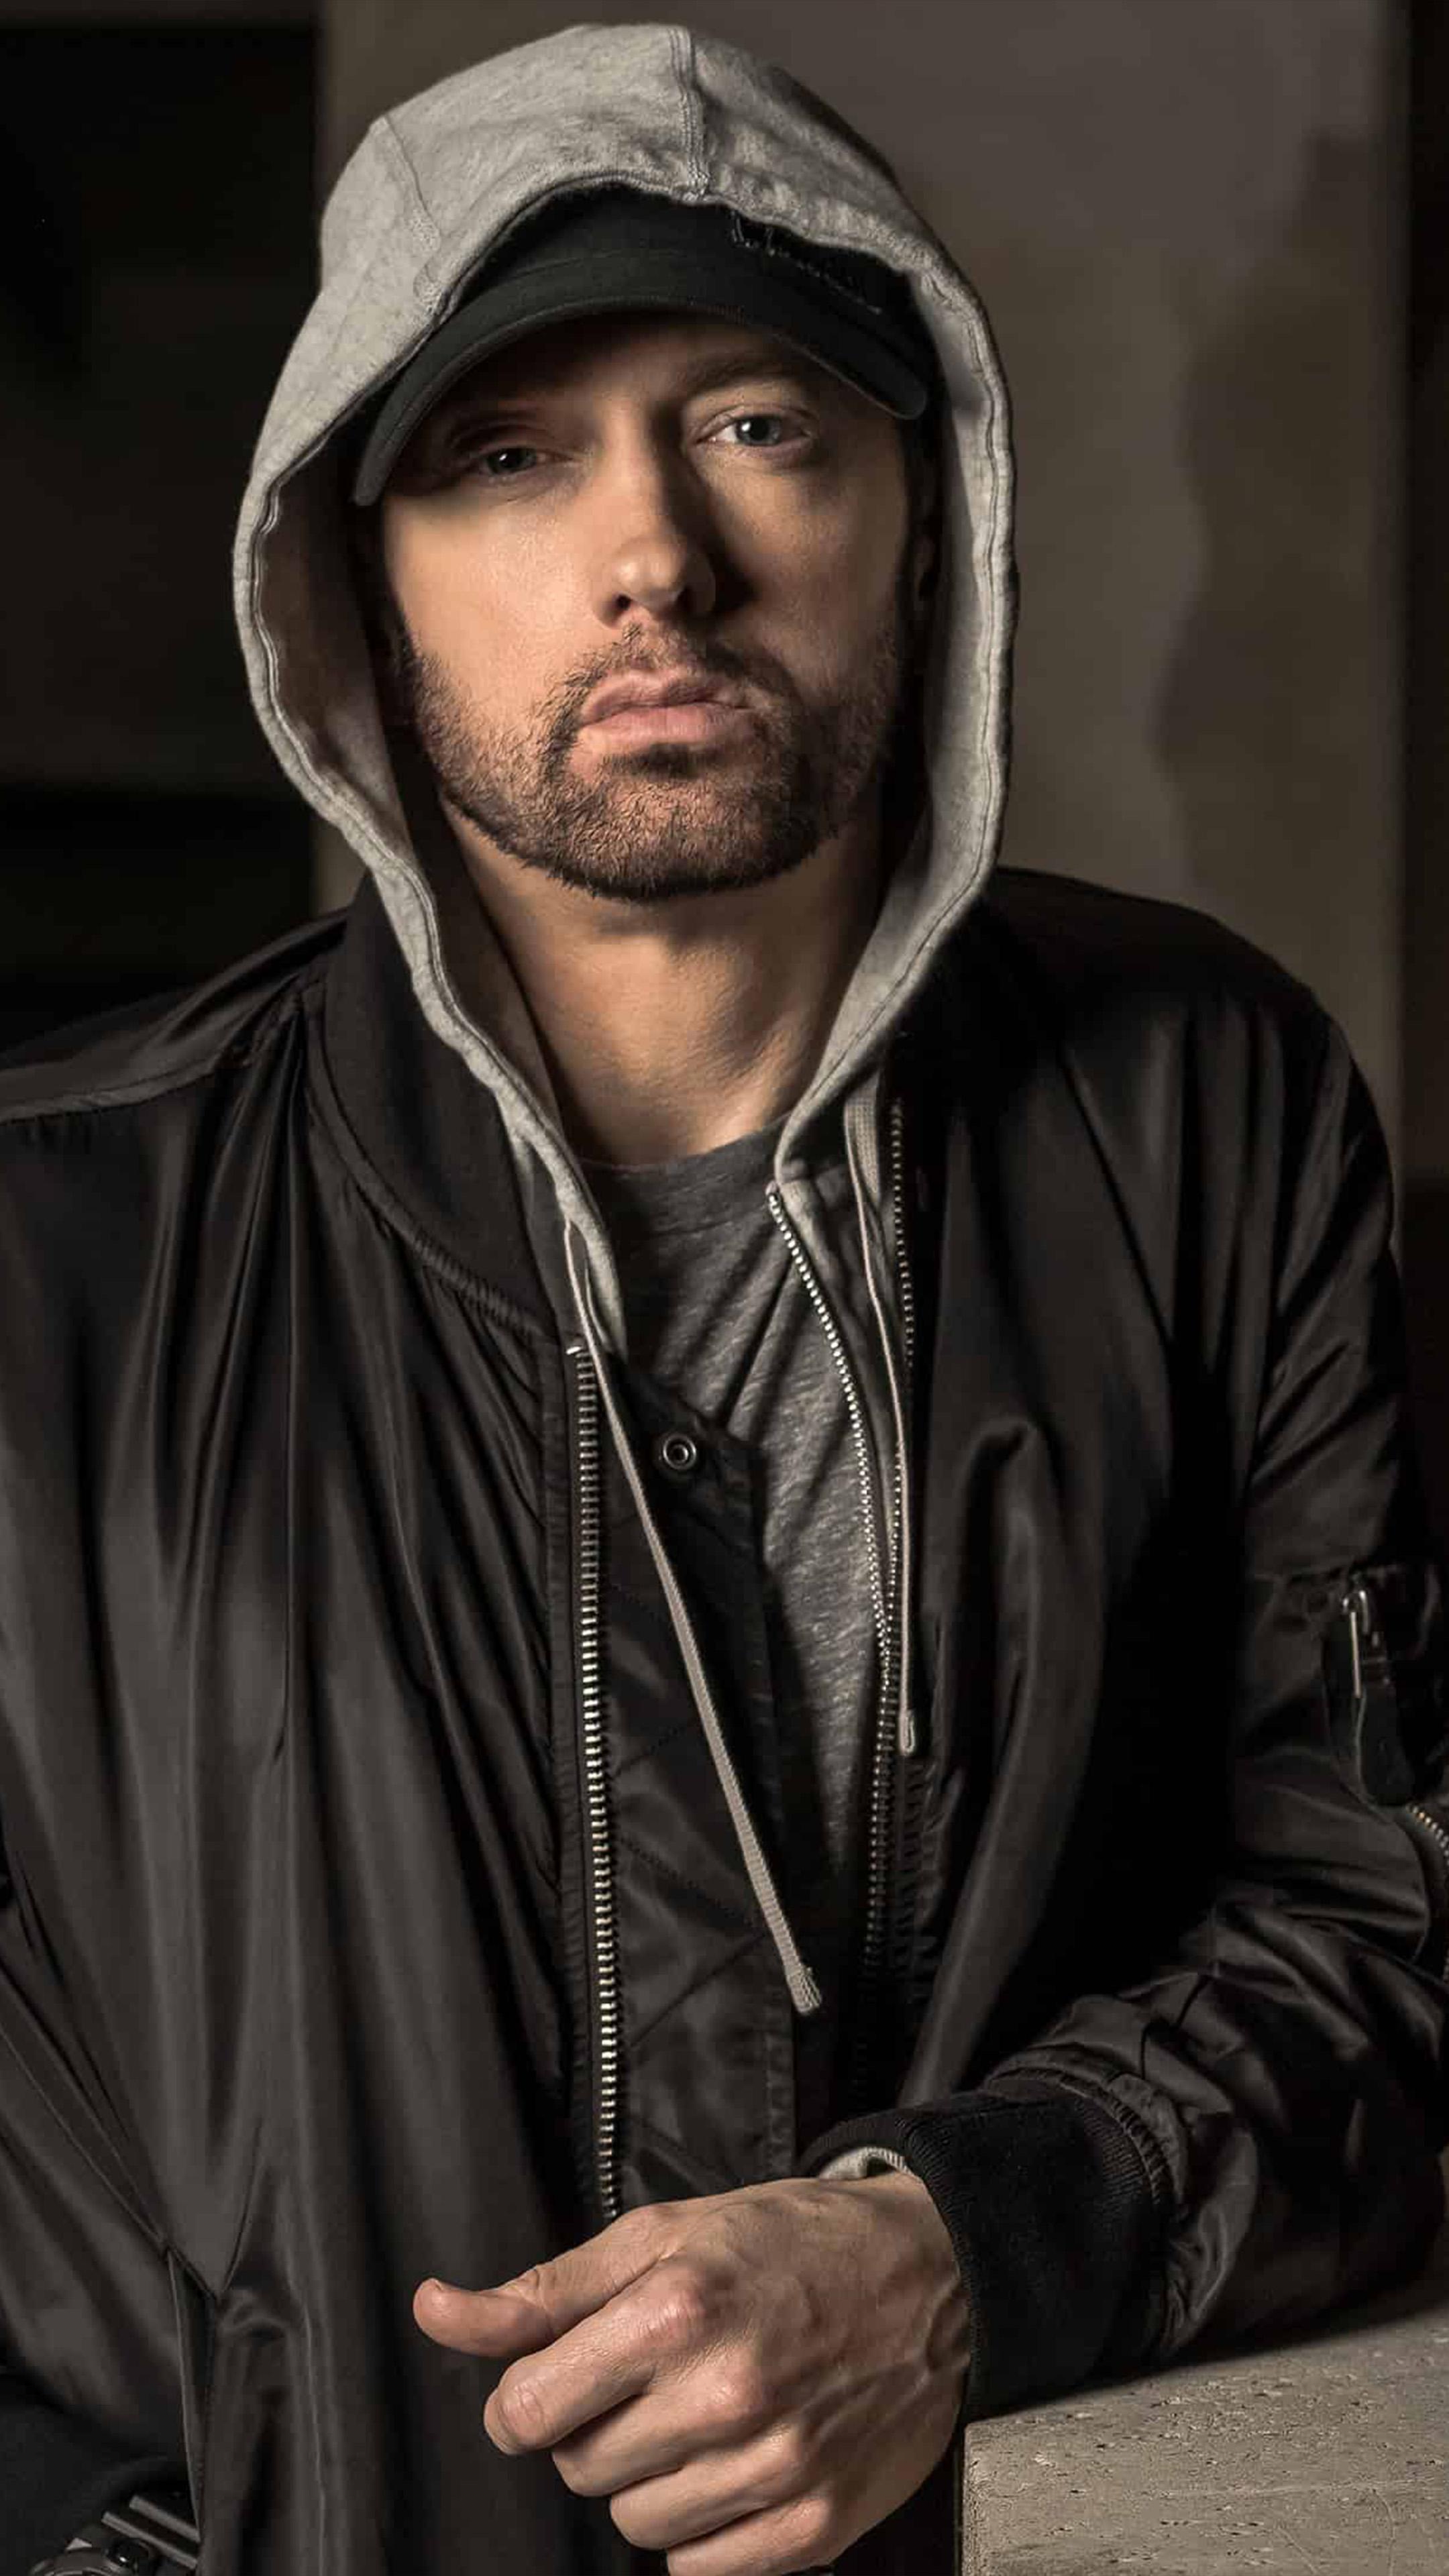 Download Eminem 2018 Free Pure 4k Ultra Hd Mobile Wallpaper